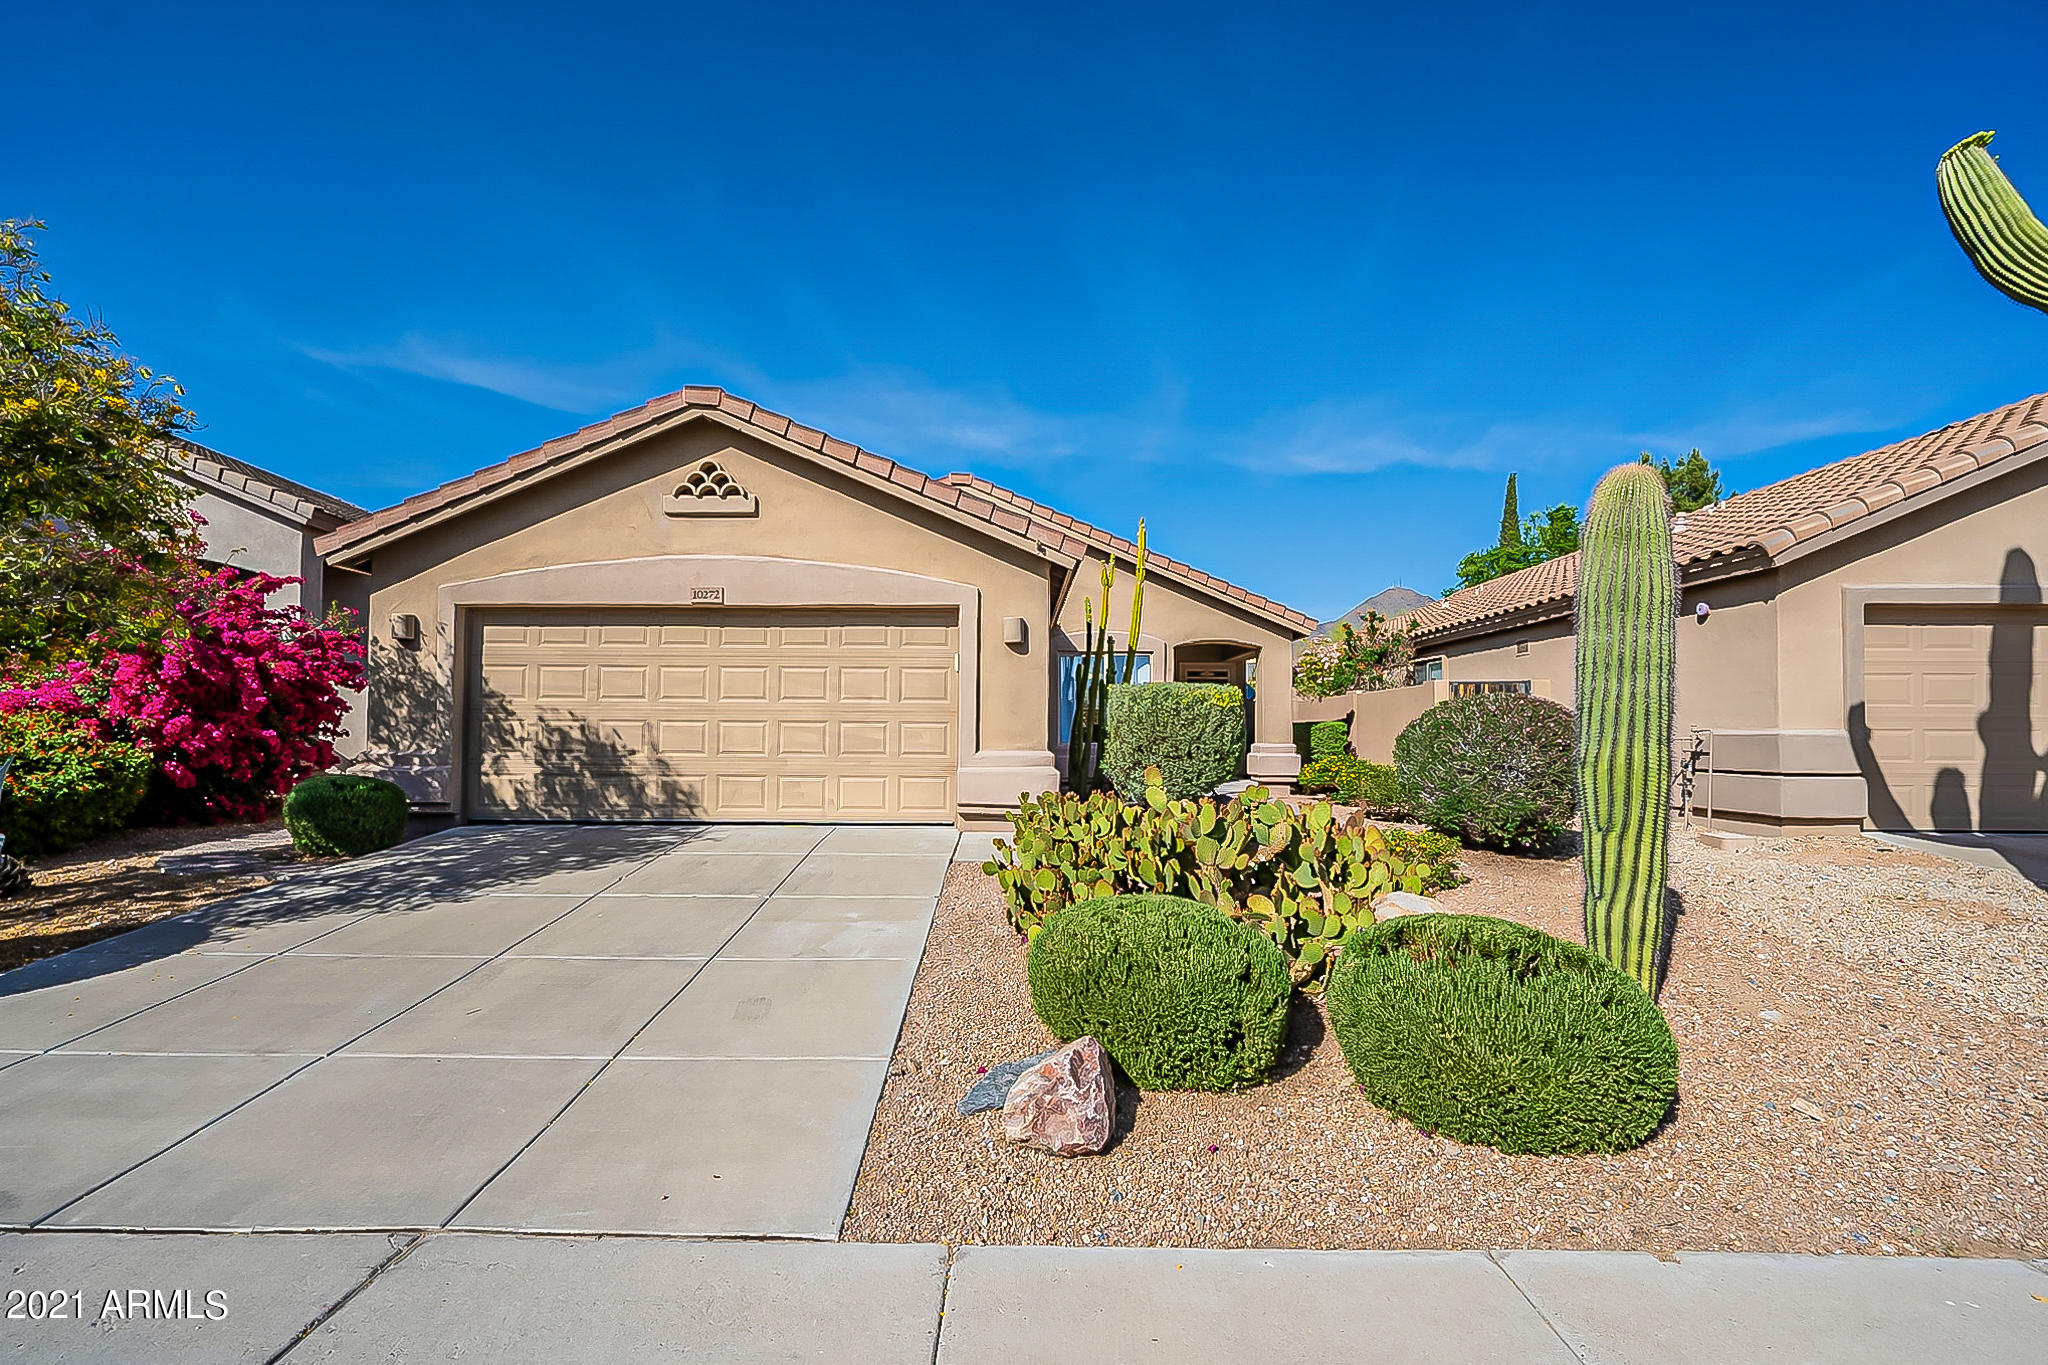 10272 E Mallow Circle, Scottsdale AZ 85255 - Photo 1